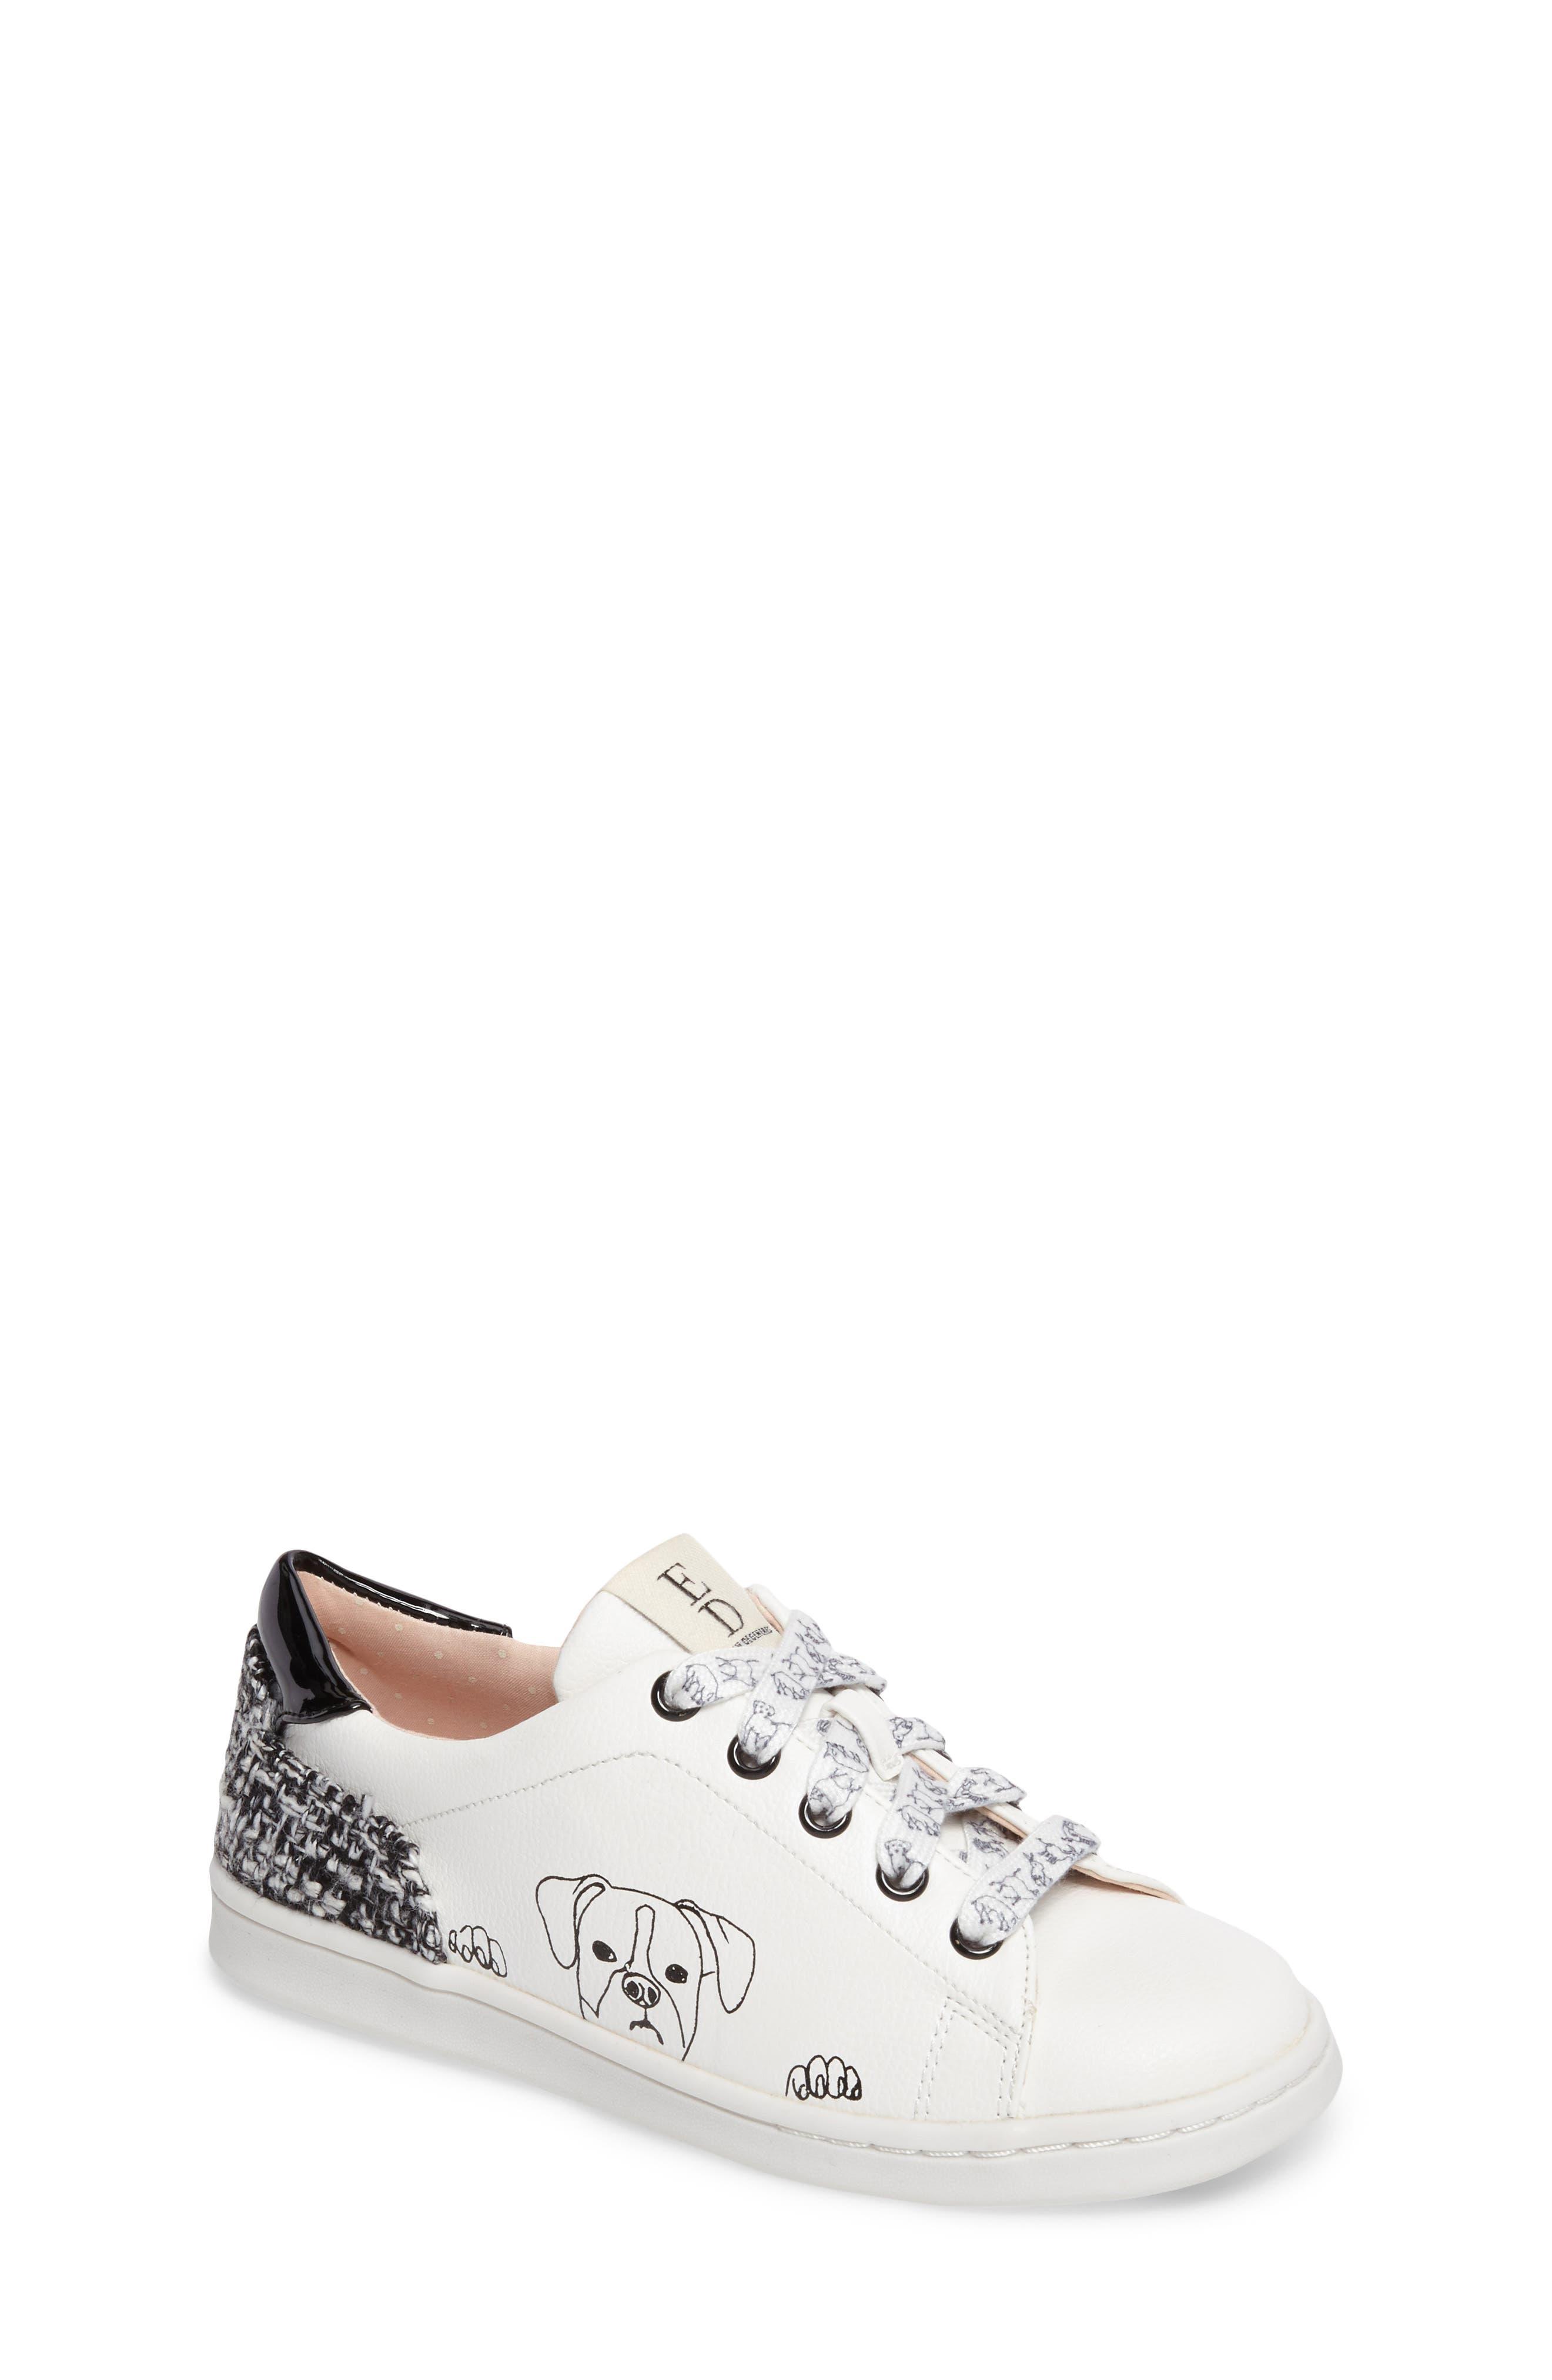 Chapapup Sneaker,                             Main thumbnail 1, color,                             WHITE